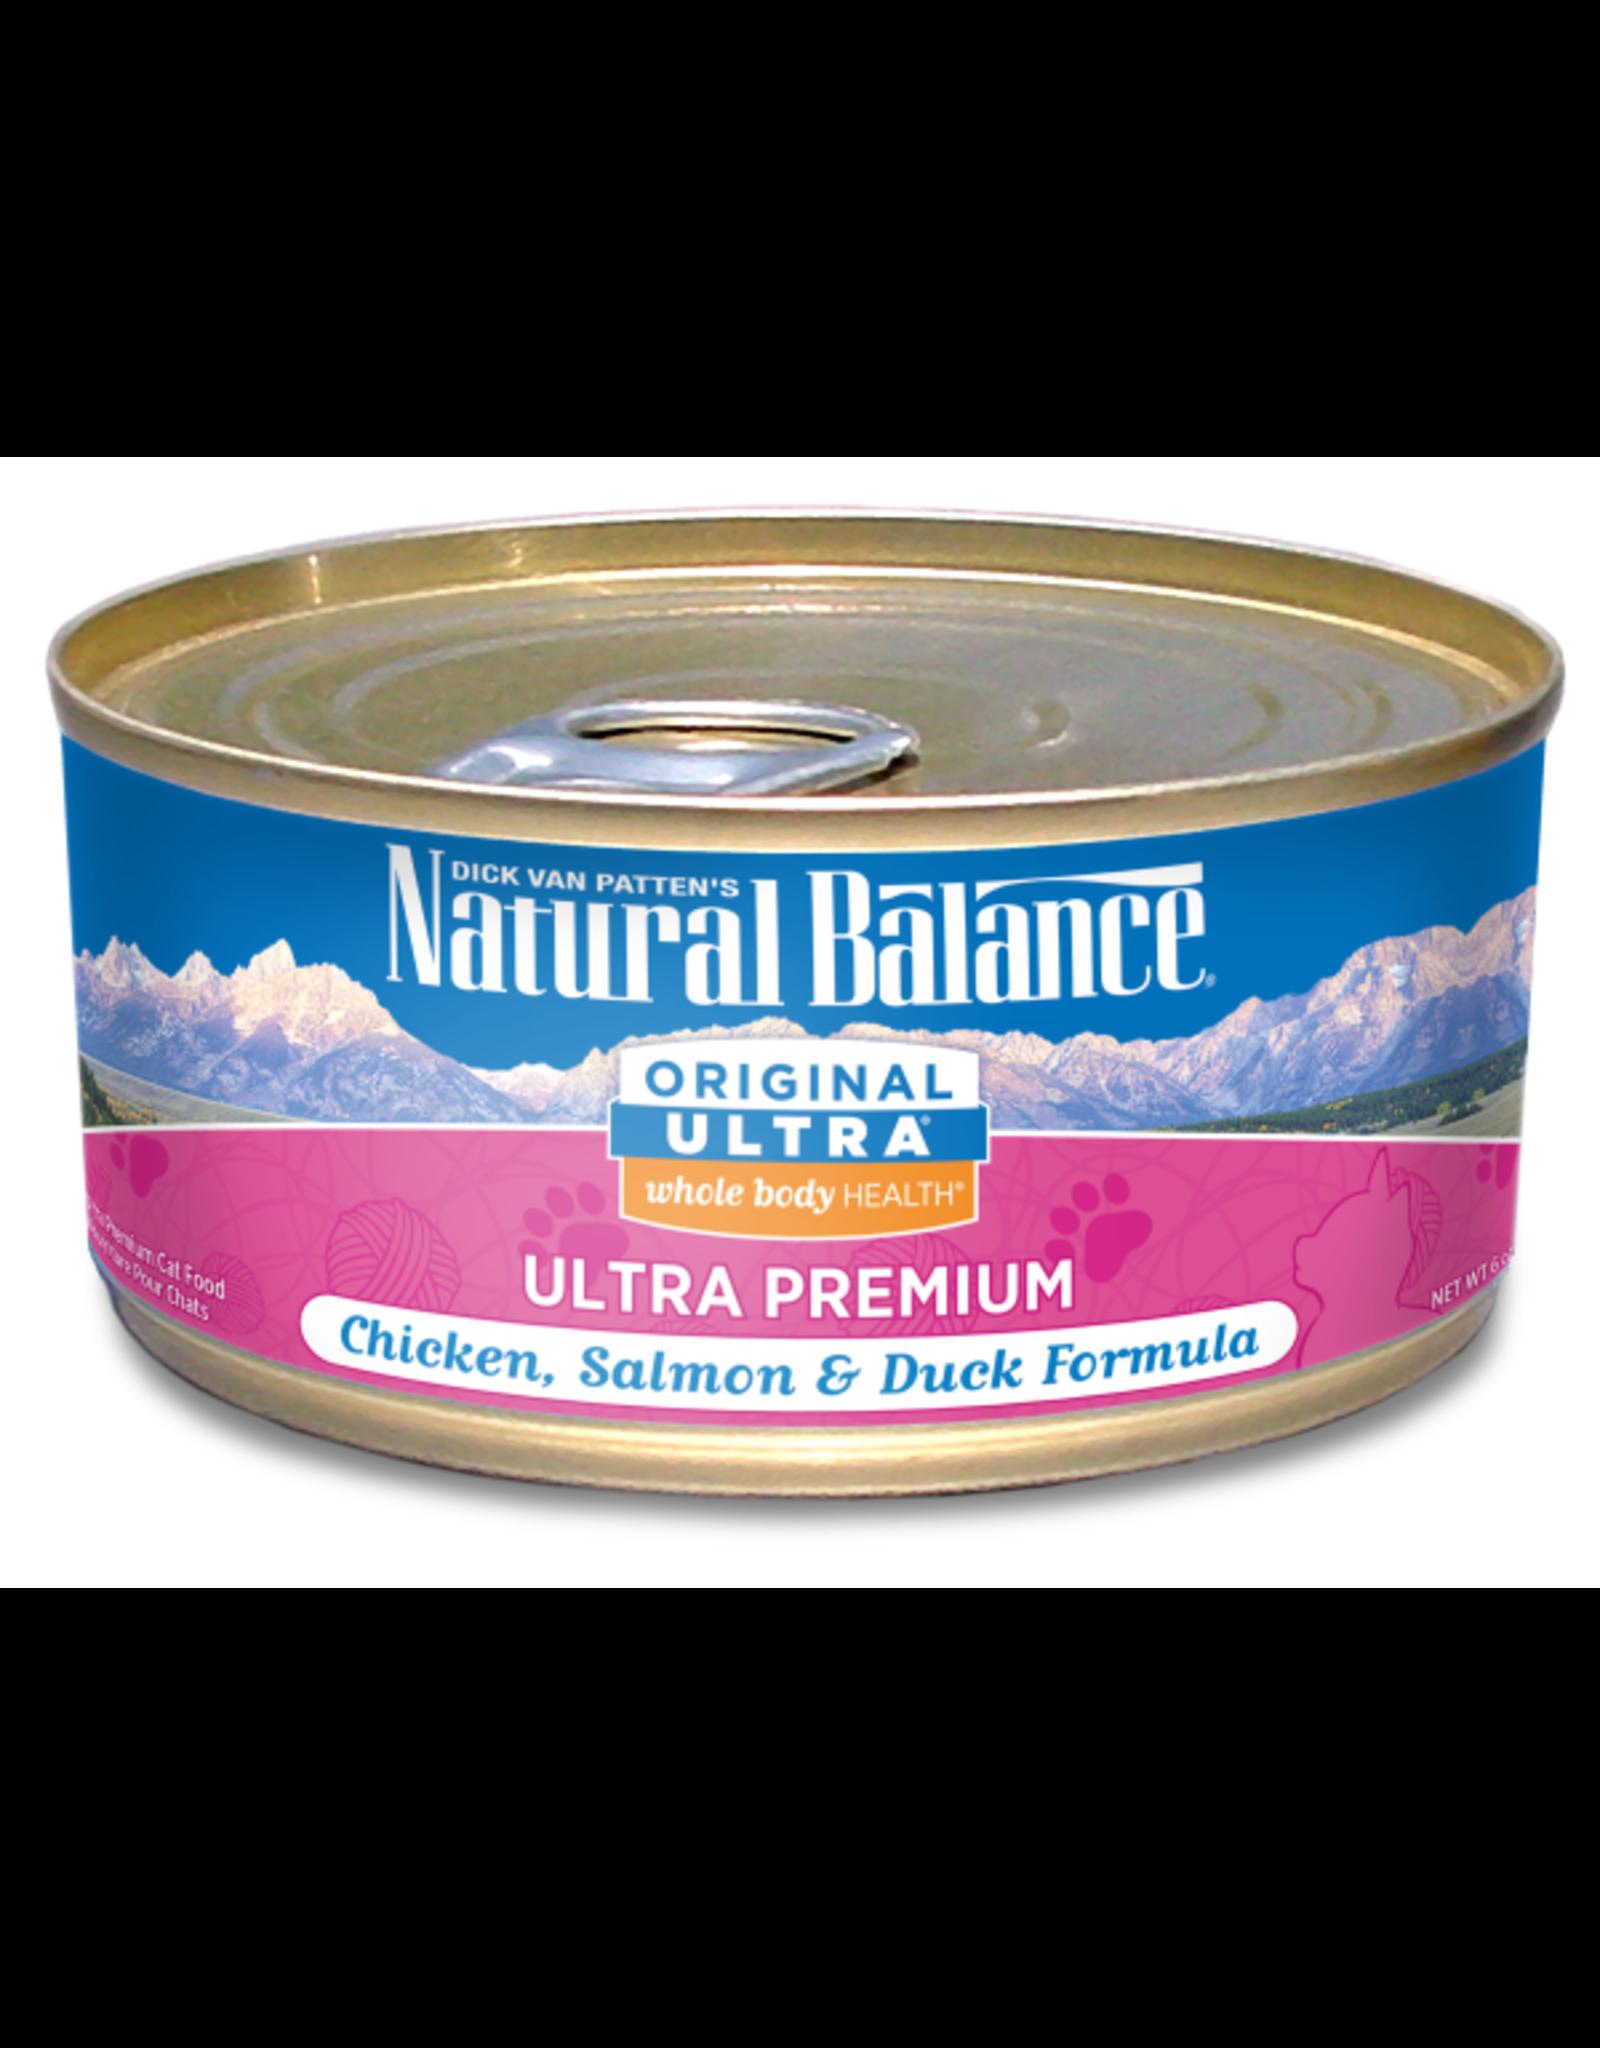 Natural Balance Natural Balance Cat Chx Salmon Duck 6 OZ